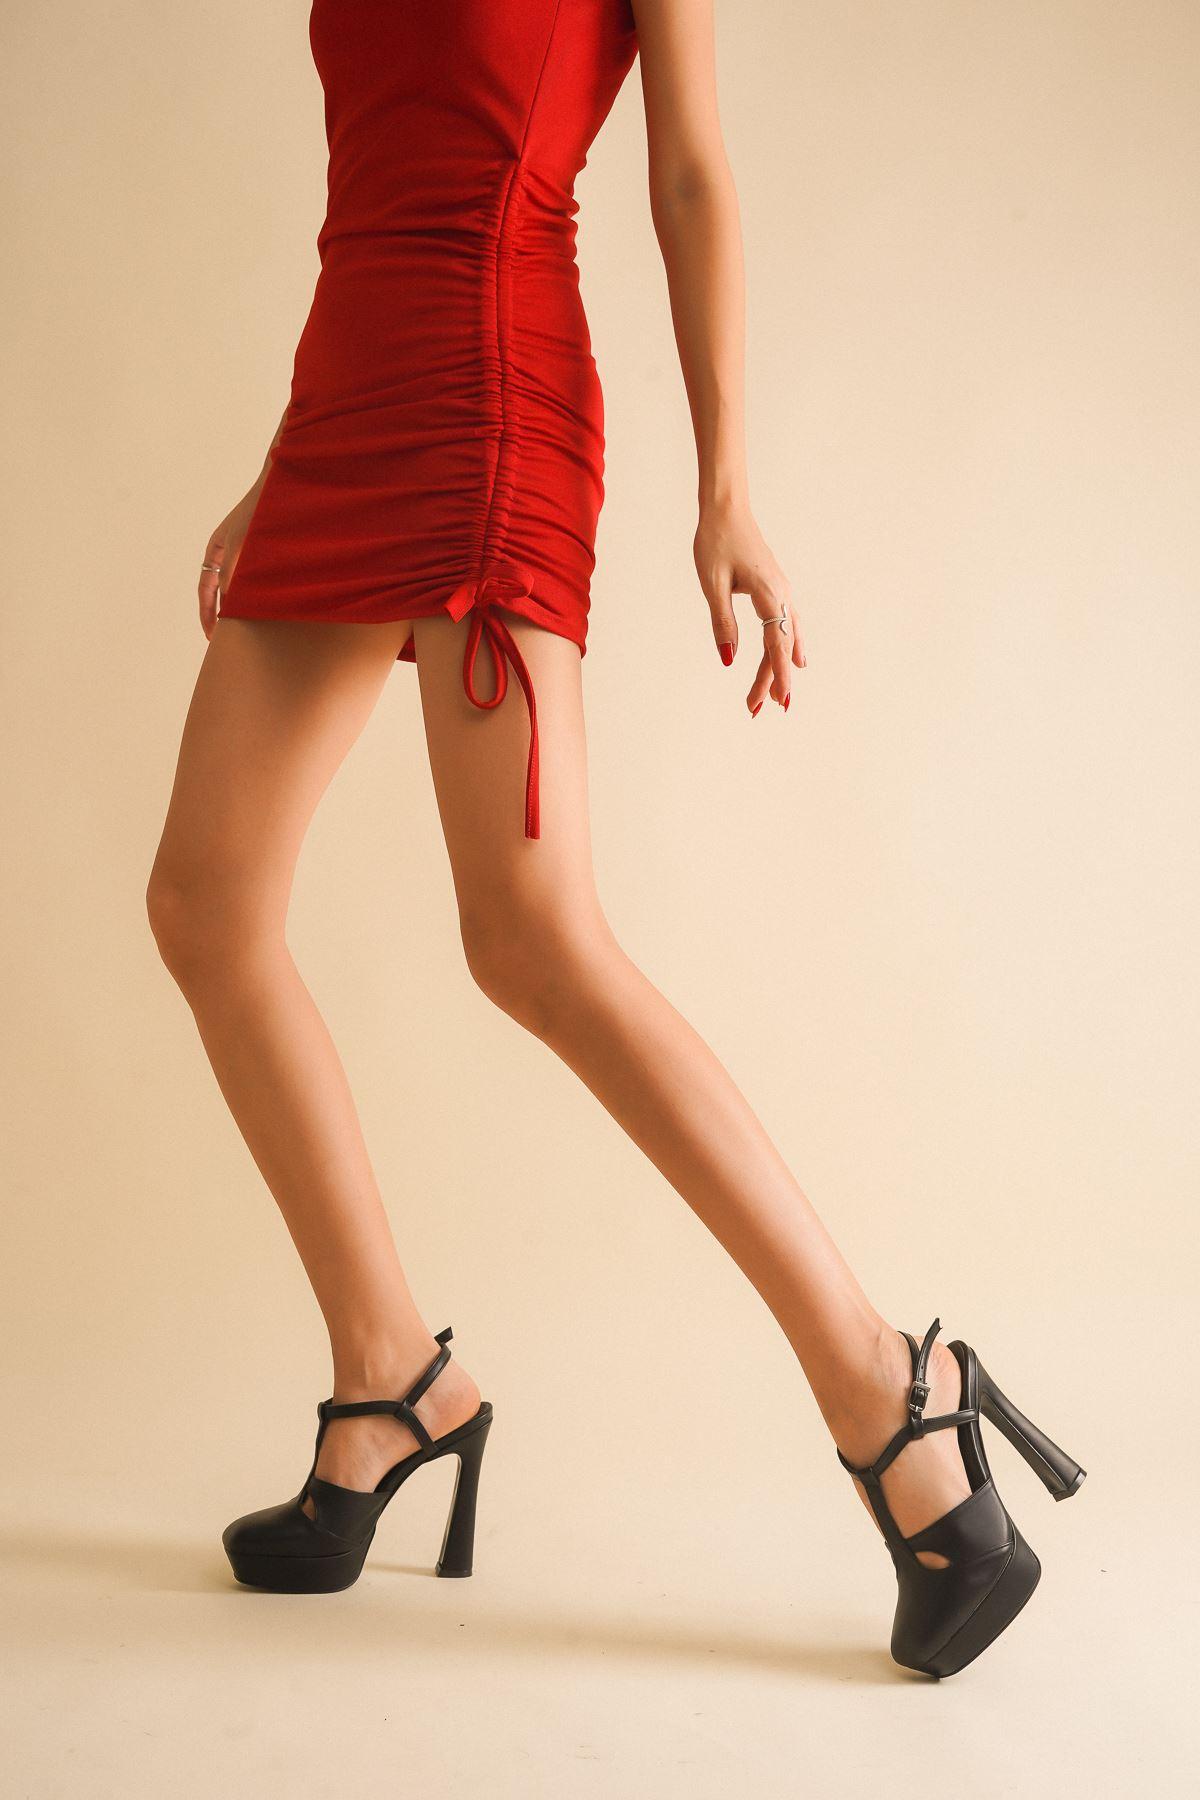 Orfila Siyah Cilt Topuklu Ayakkabı